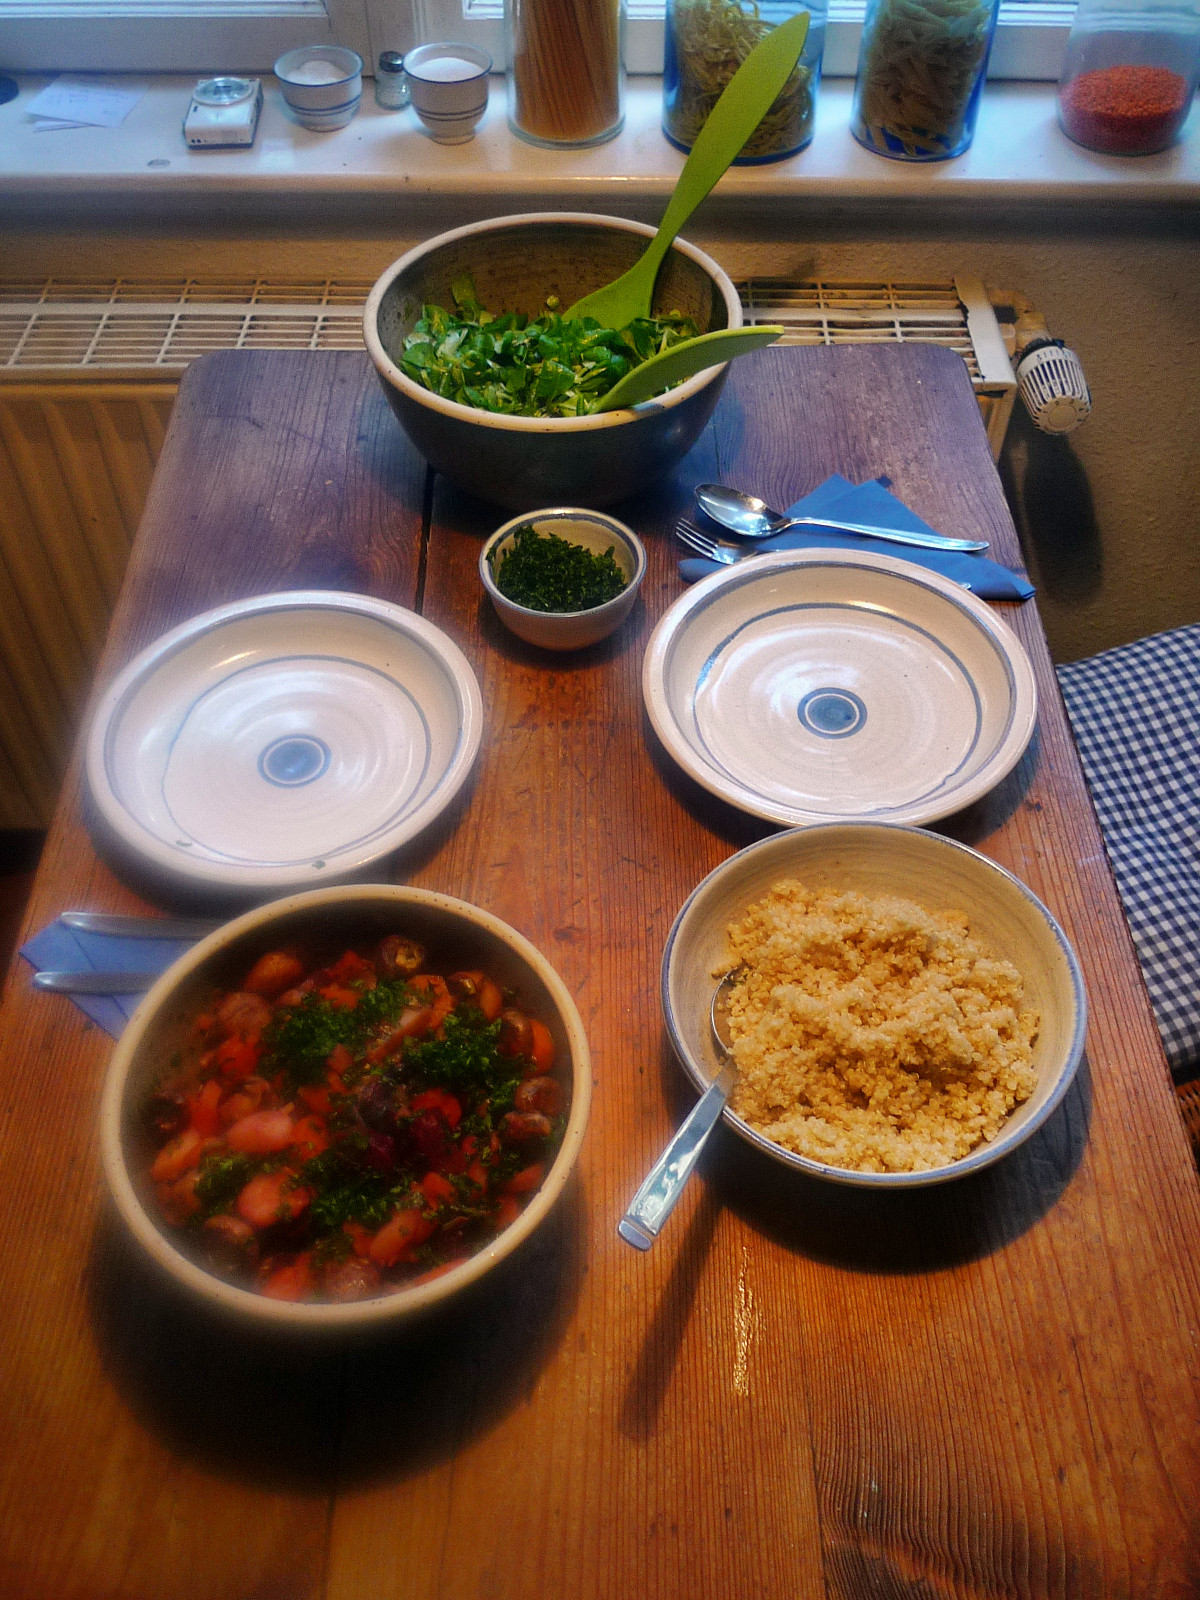 Wurzelgemüse-Quinoa-Feldsalat - 22.11.14   (10)